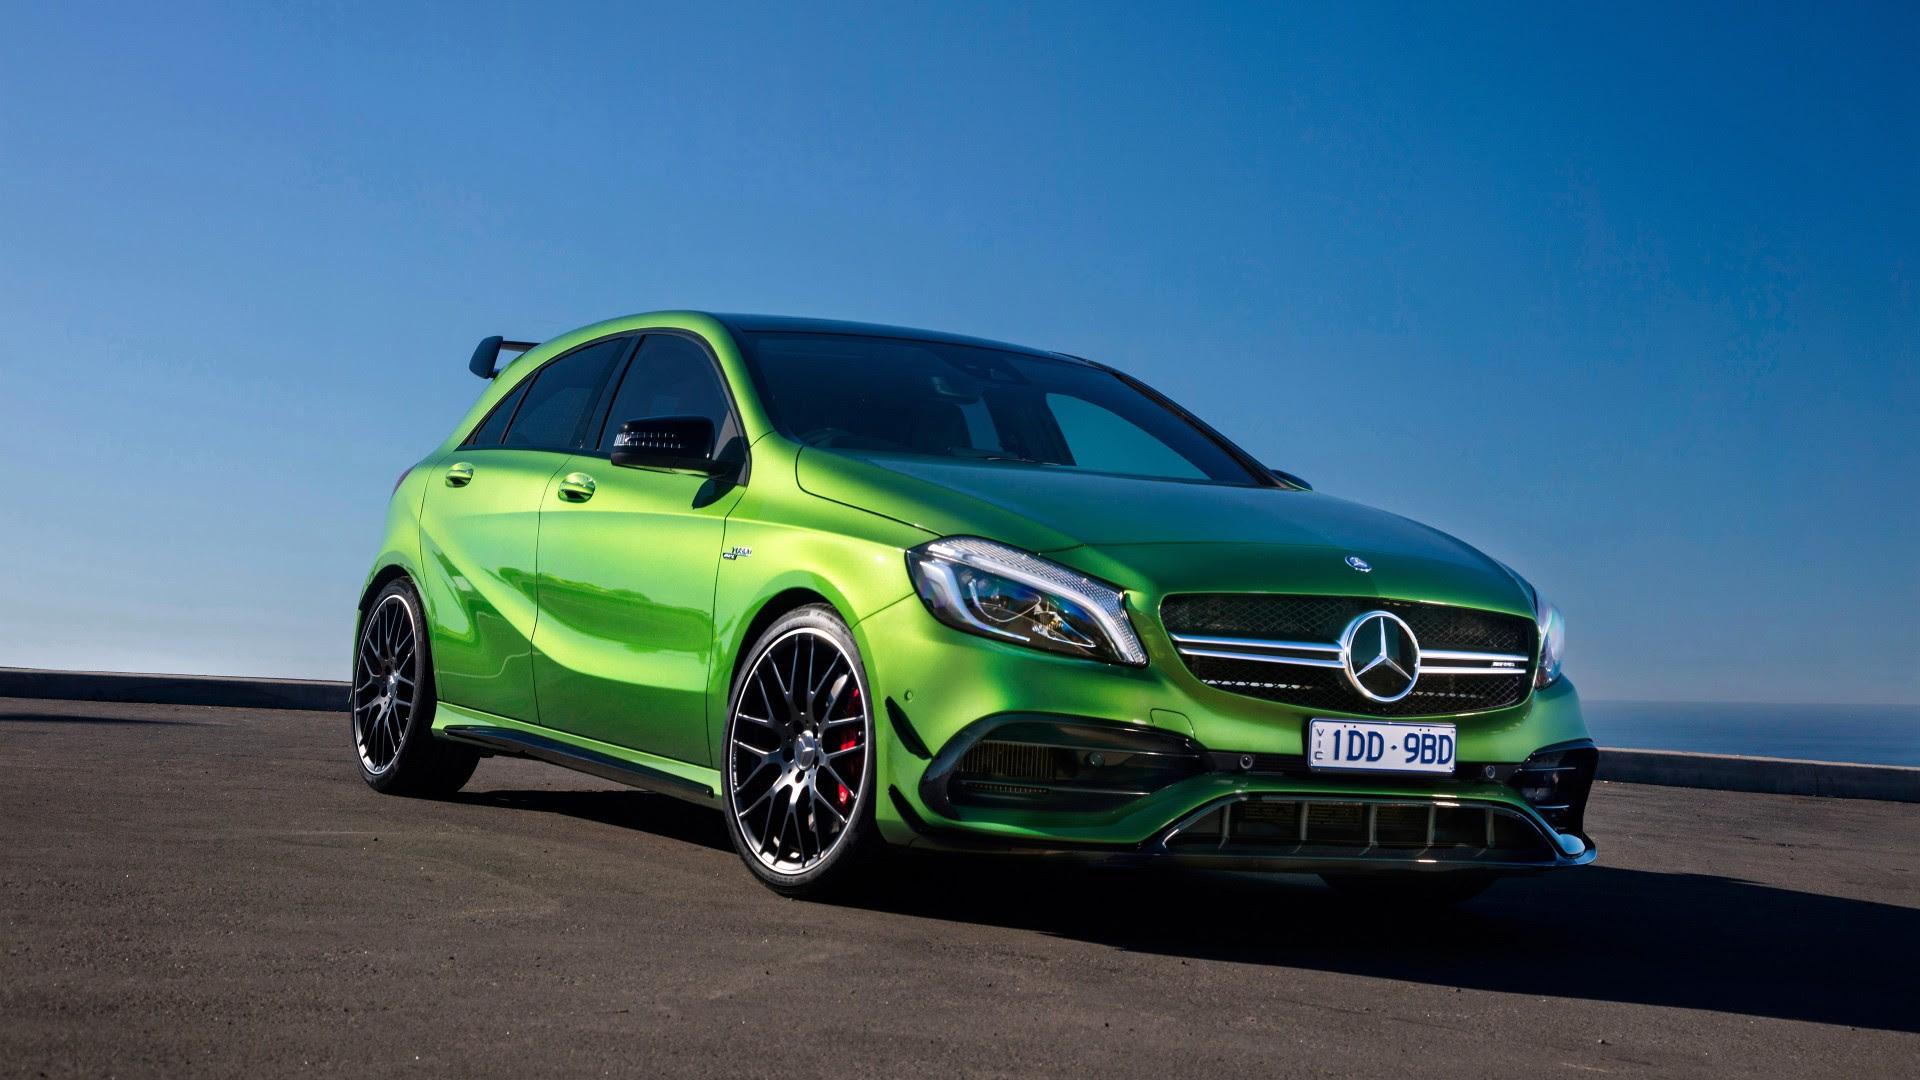 2016 Mercedes Benz A Class Wallpaper | HD Car Wallpapers ...